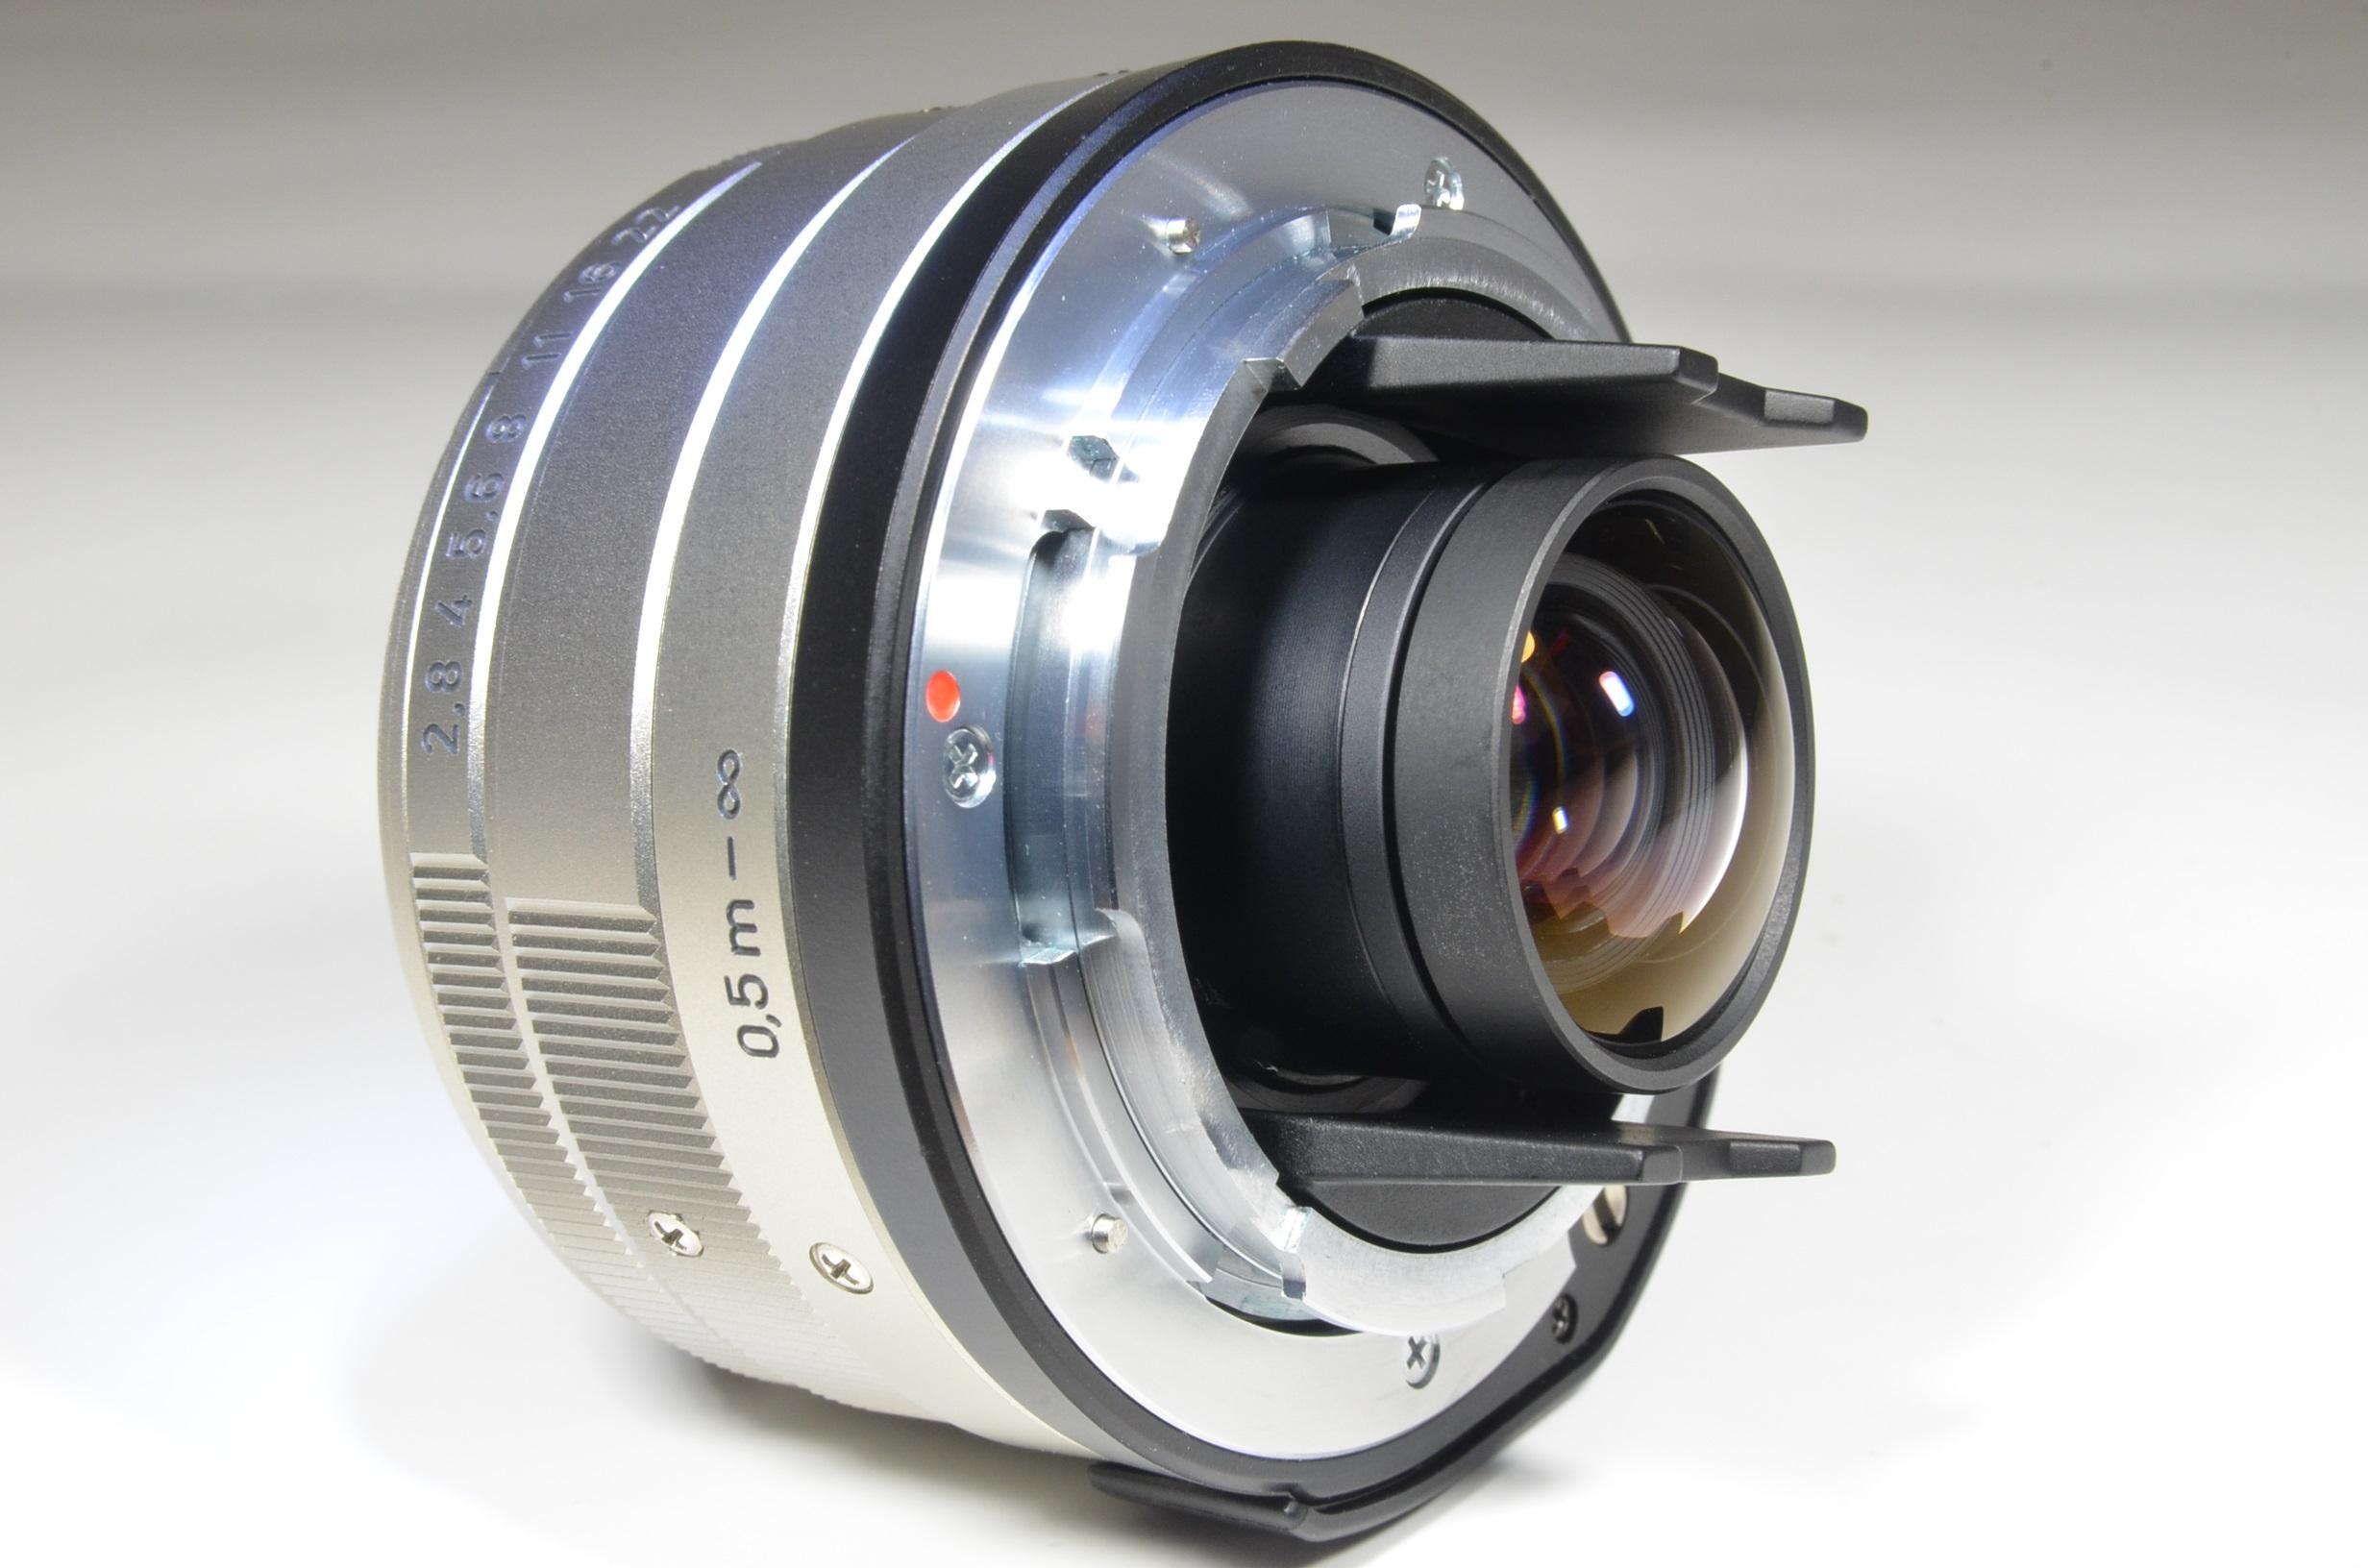 contax g2 camera / planar 45mm f2 / biogon 28 f2.8 / sonnar 90mm f2.8 / tla200